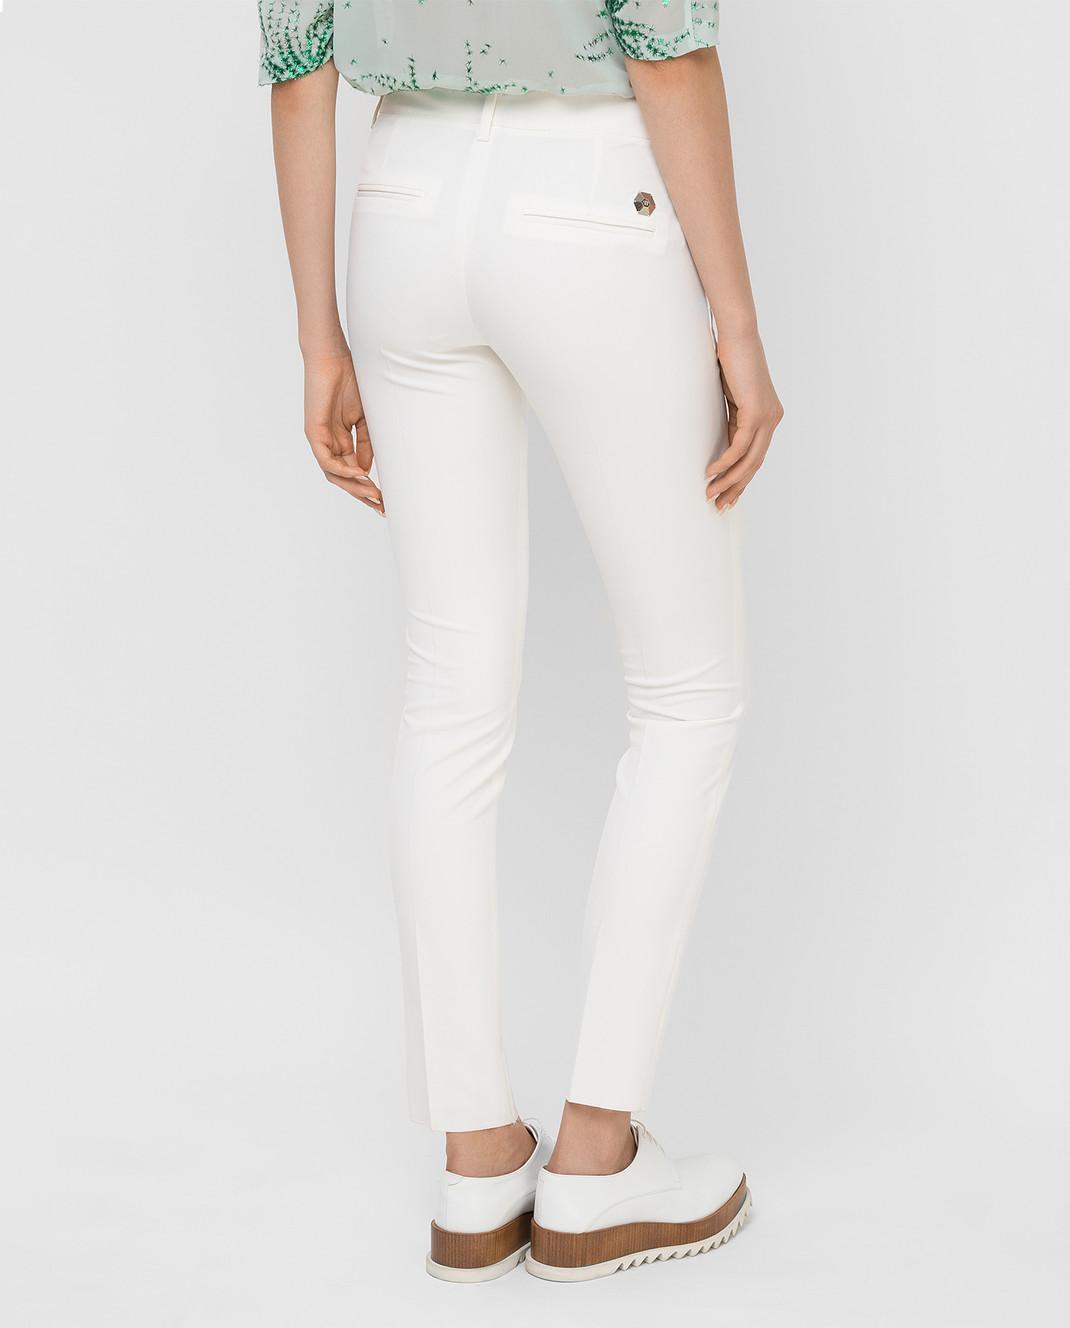 Philipp Plein Белые брюки CWRT0022 изображение 4